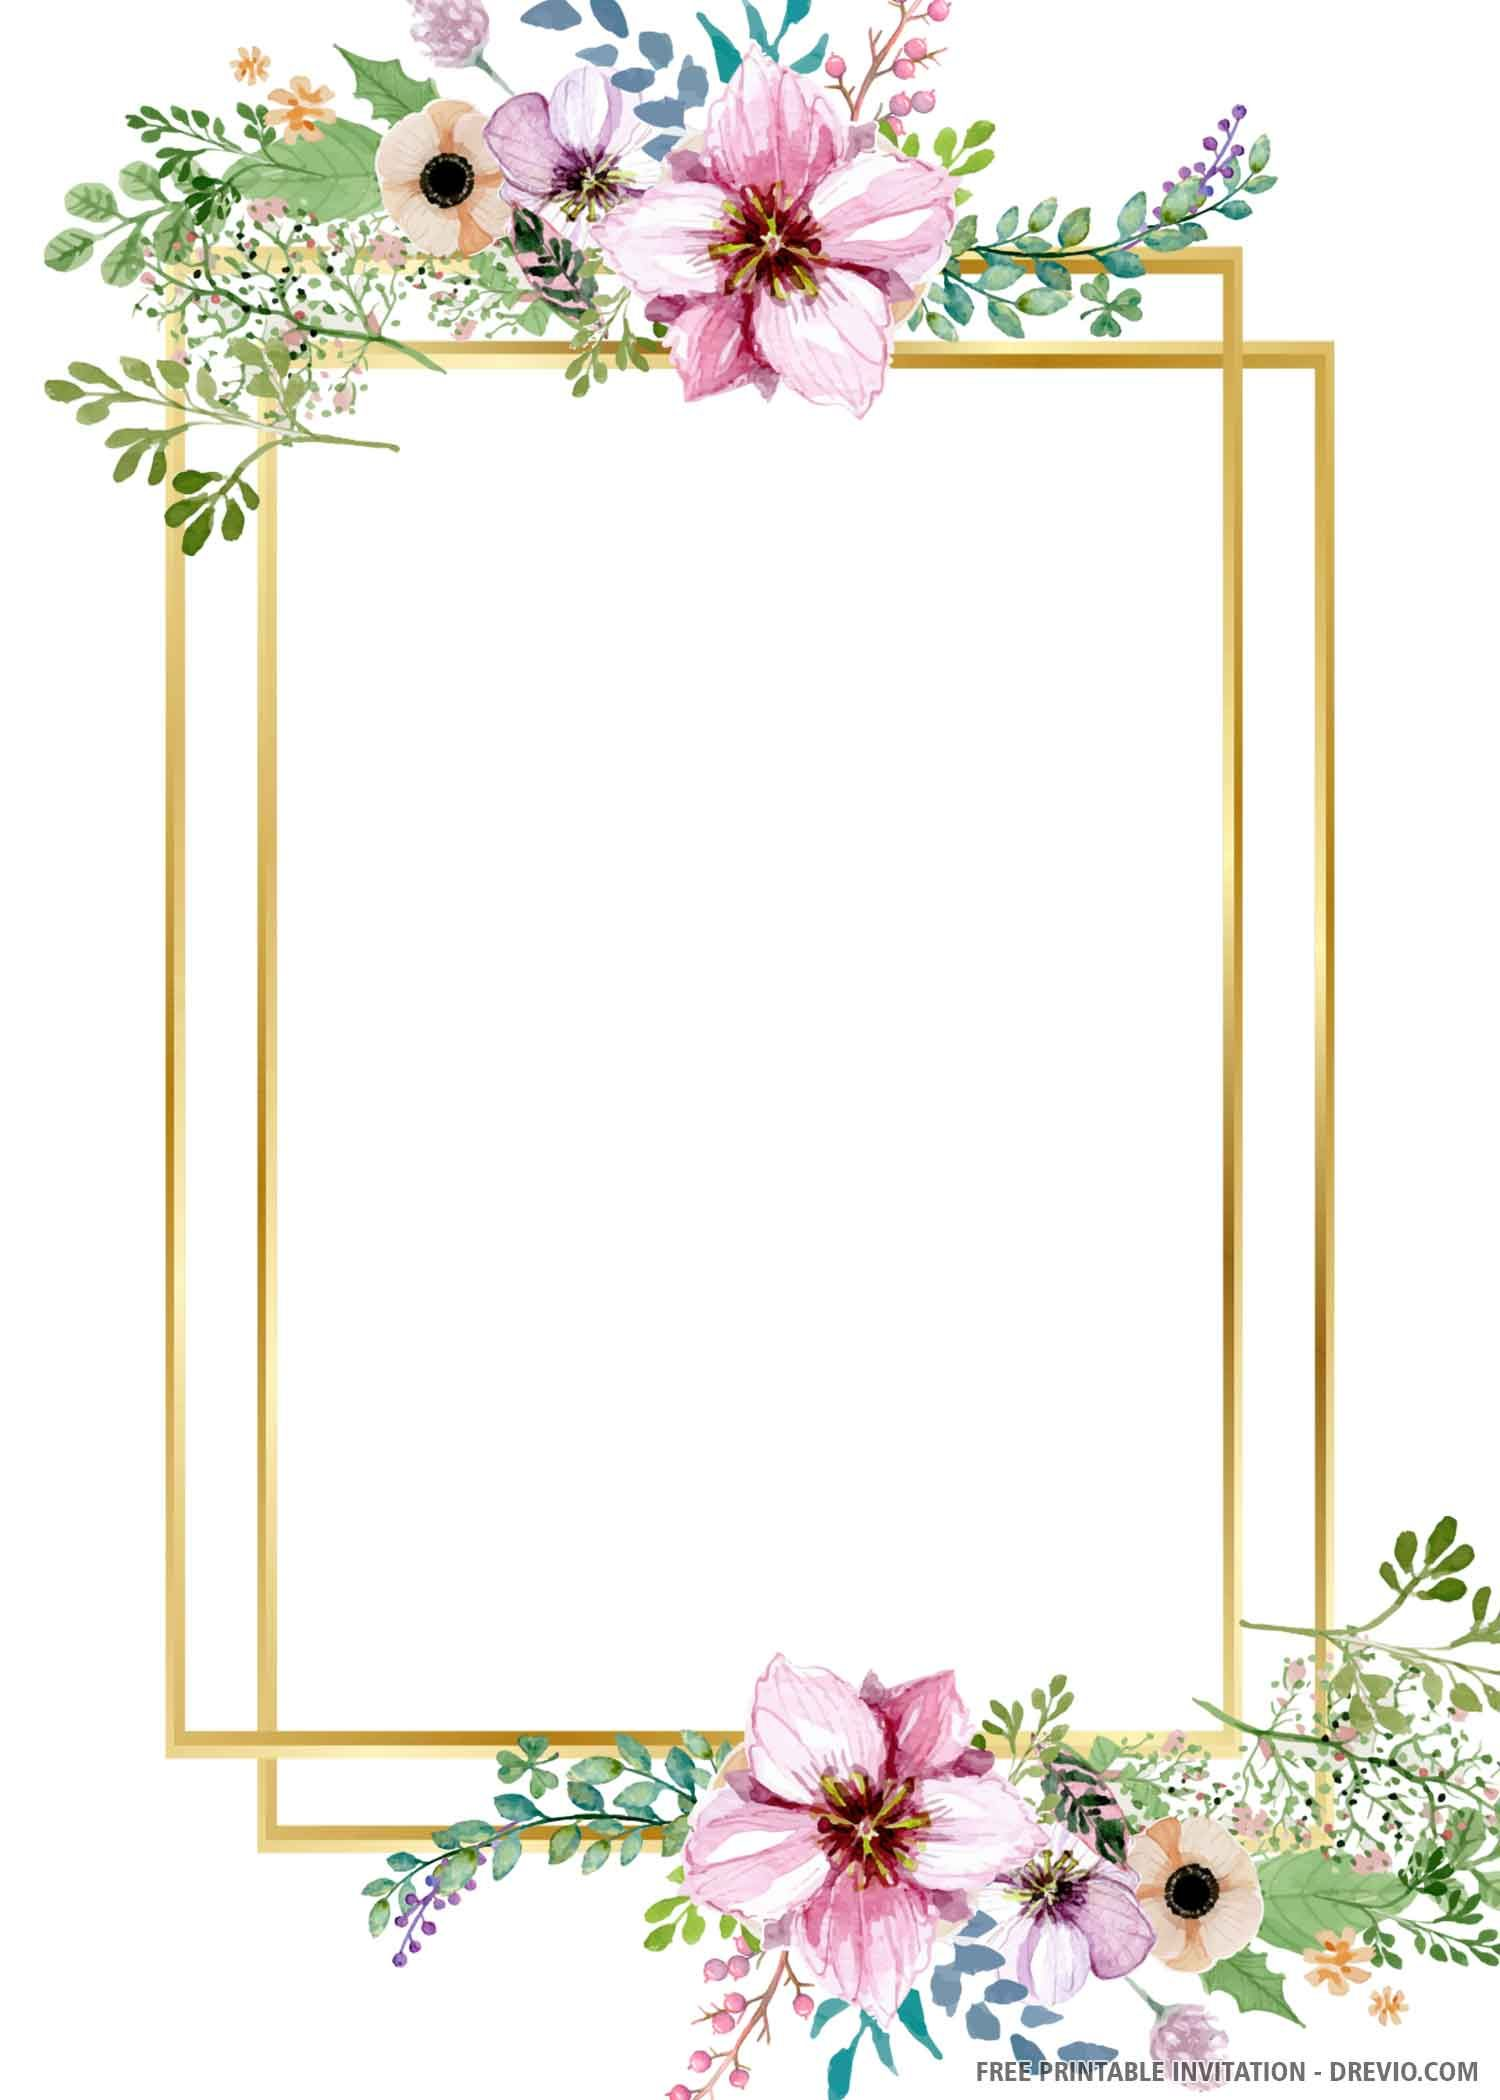 Free Printable Gold Wedding Invitation Template Gold Wedding Invitations Free Wedding Invitations Wedding Invitations Printable Templates